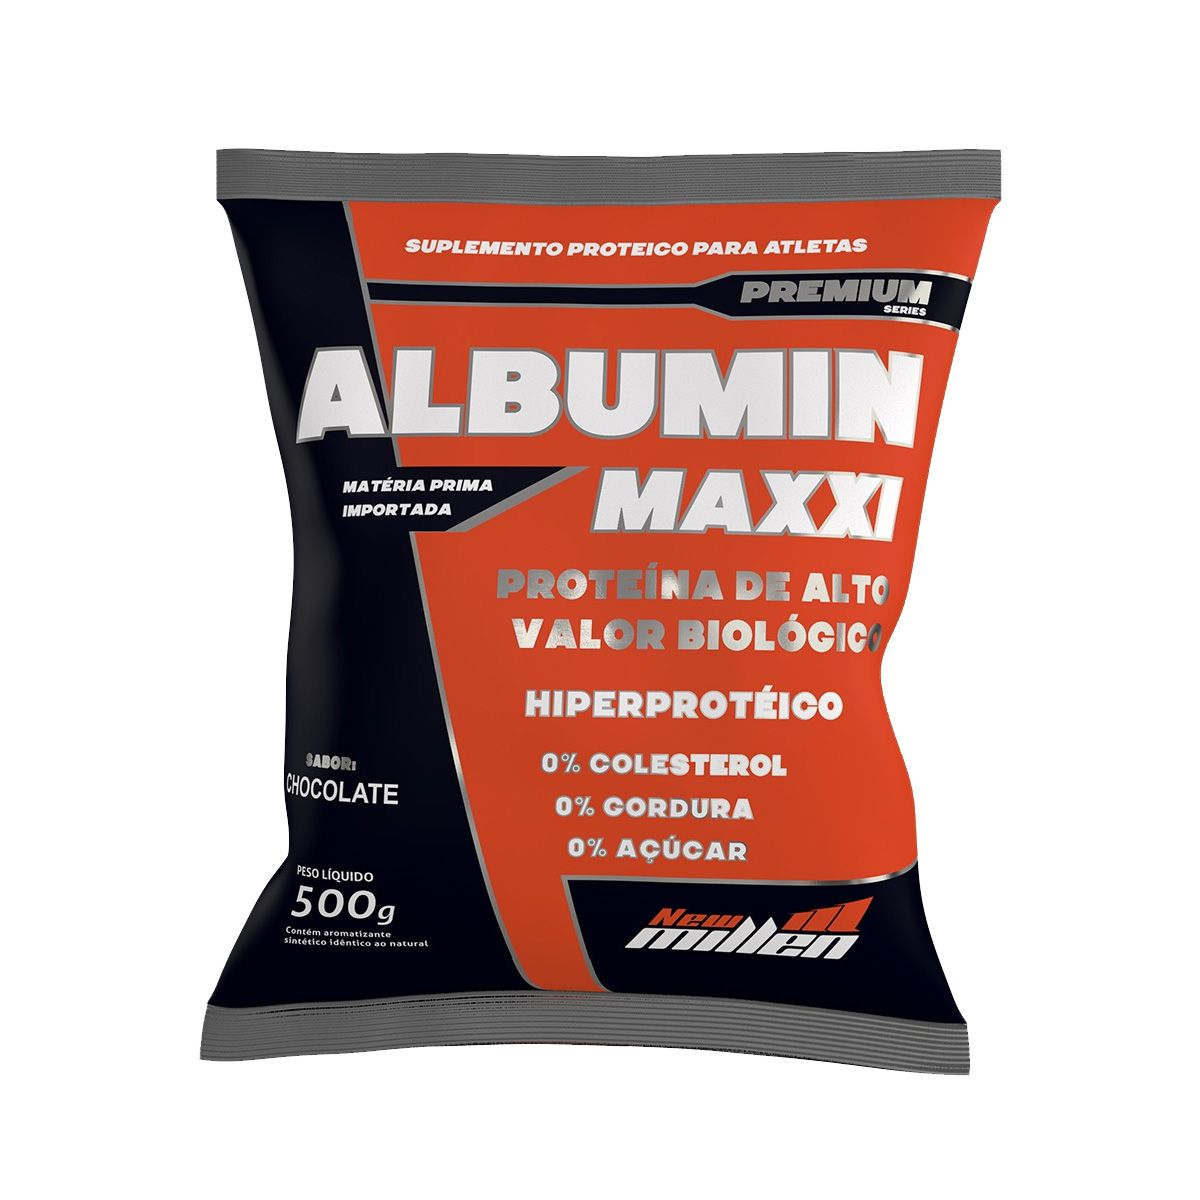 Albumin Maxxi Premium 500 g - New Millen